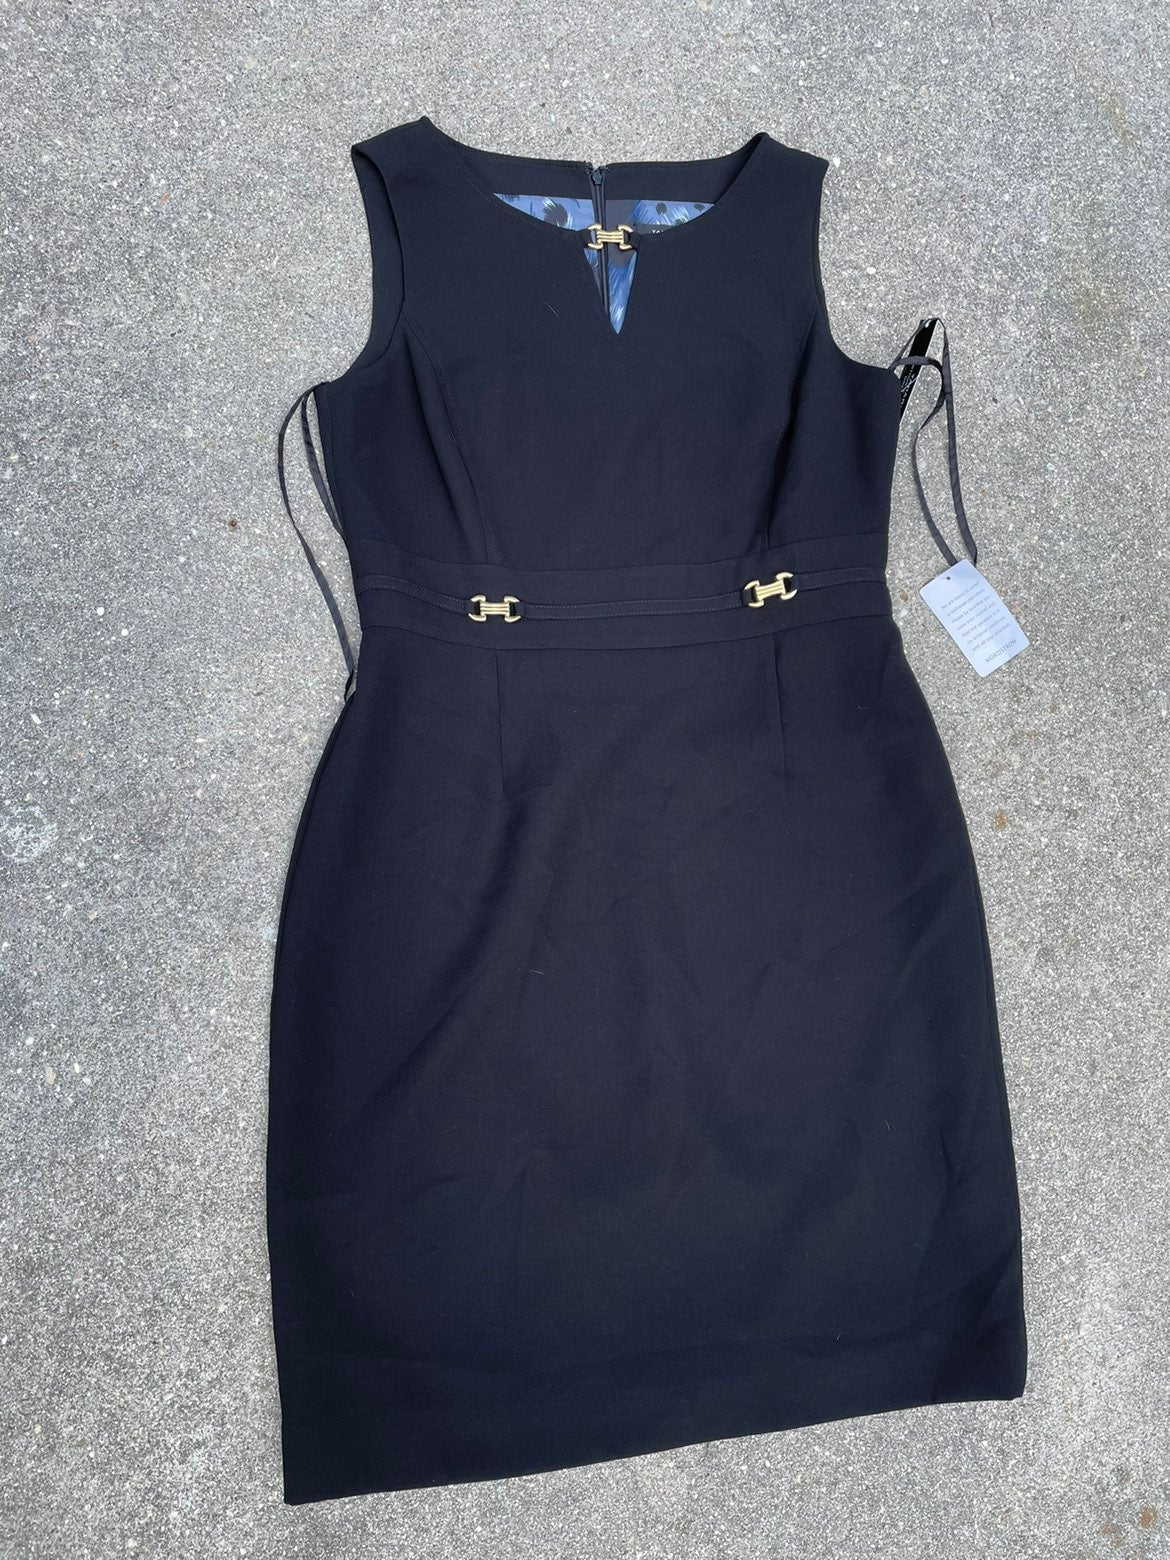 Nordstrom Tahari Arthur S. Levine Dress